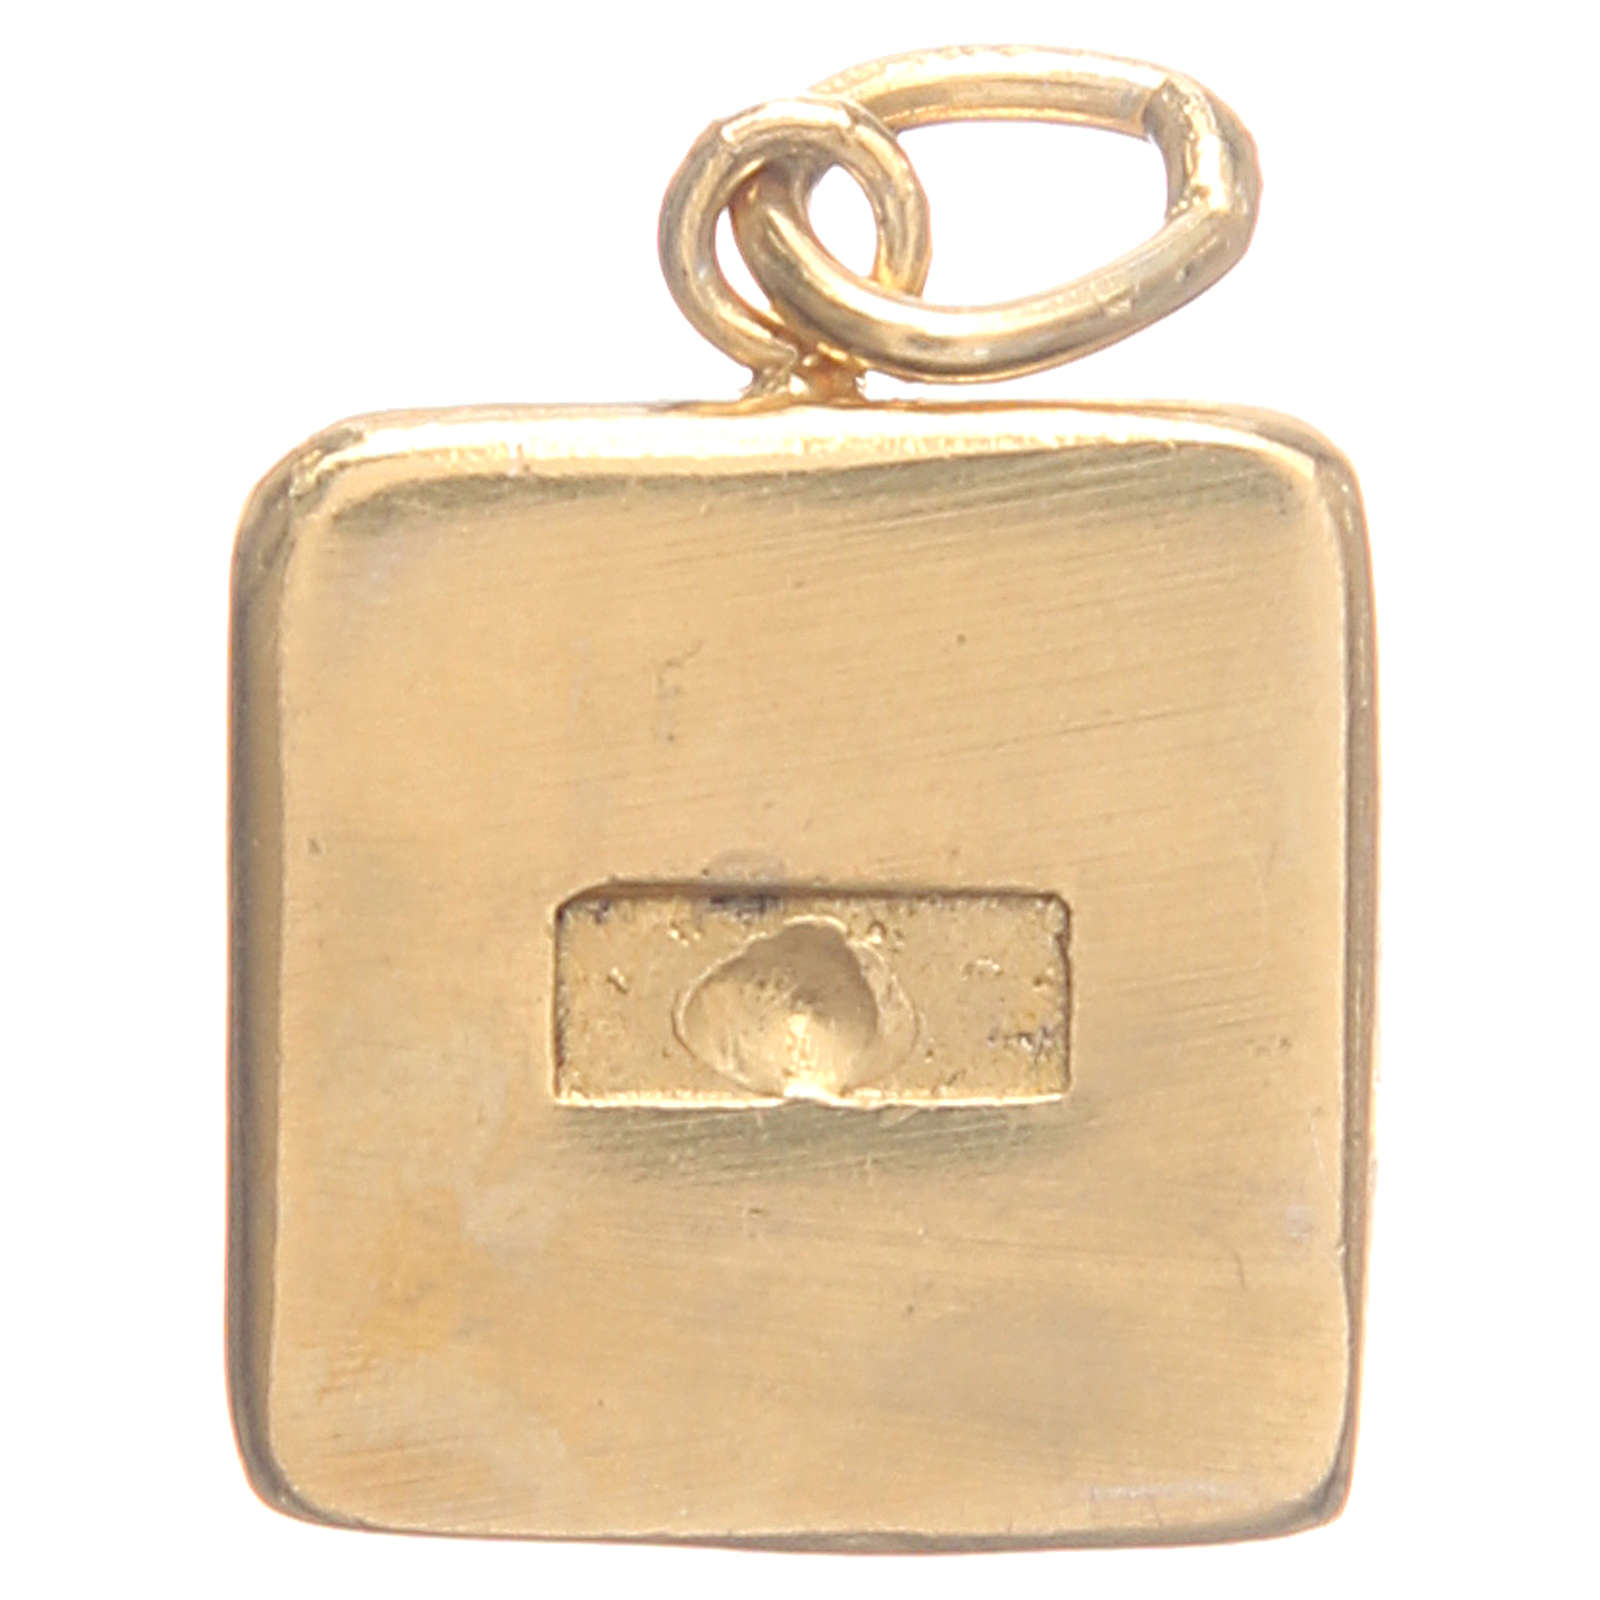 Medaglia argento 800 Chiavi Vaticano 1,5x1,5 cm 4